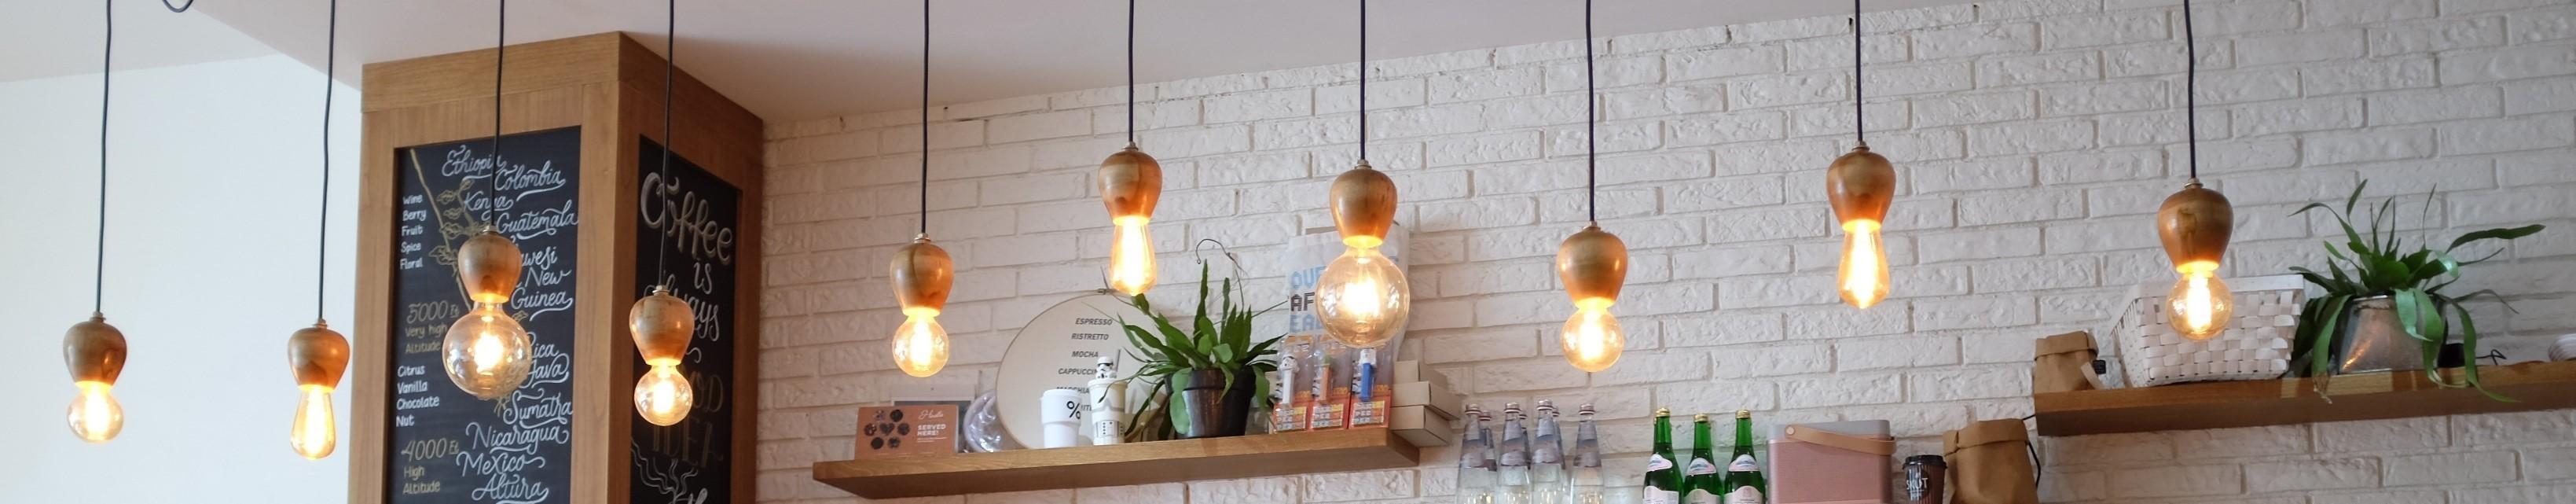 coffee_shop_barista_cafe (3)